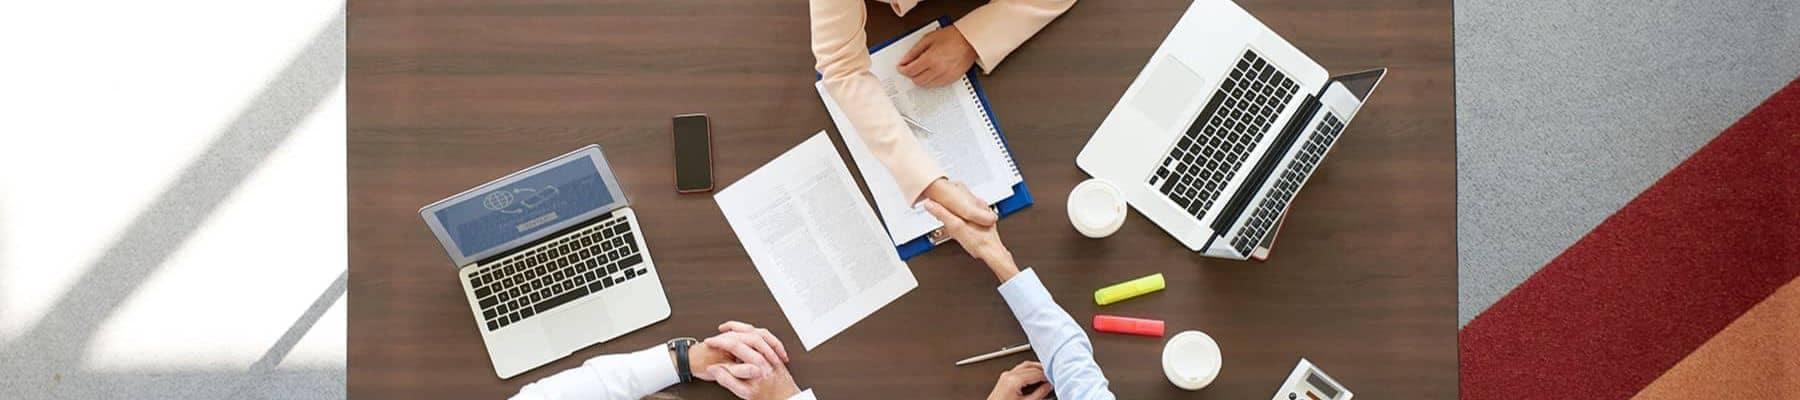 careers handshake